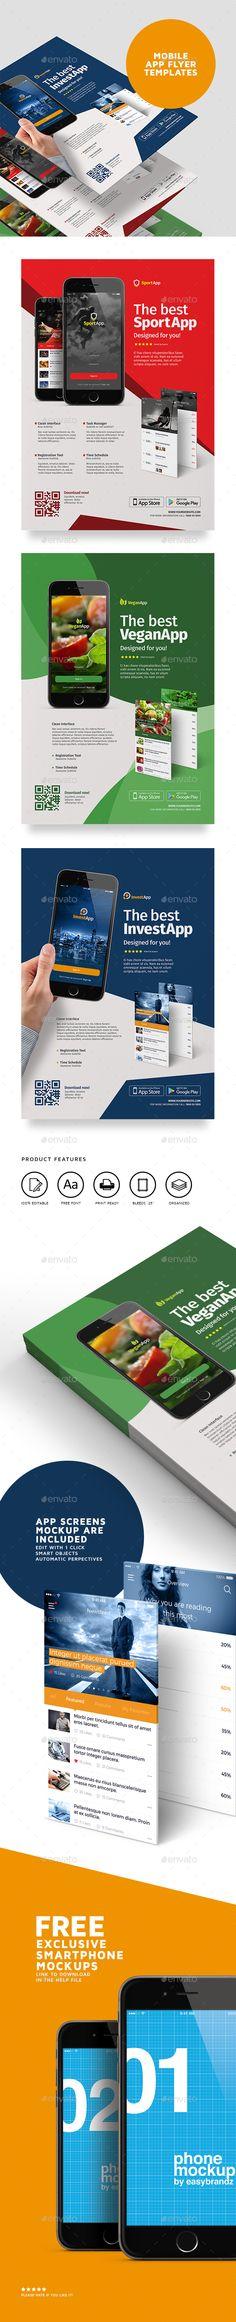 Mobile App Flyer Design Template Vol.01 - Commerce Flyer Template PSD. Download here: http://graphicriver.net/item/mobile-app-flyer-template-vol01/16473658?s_rank=916&ref=yinkira